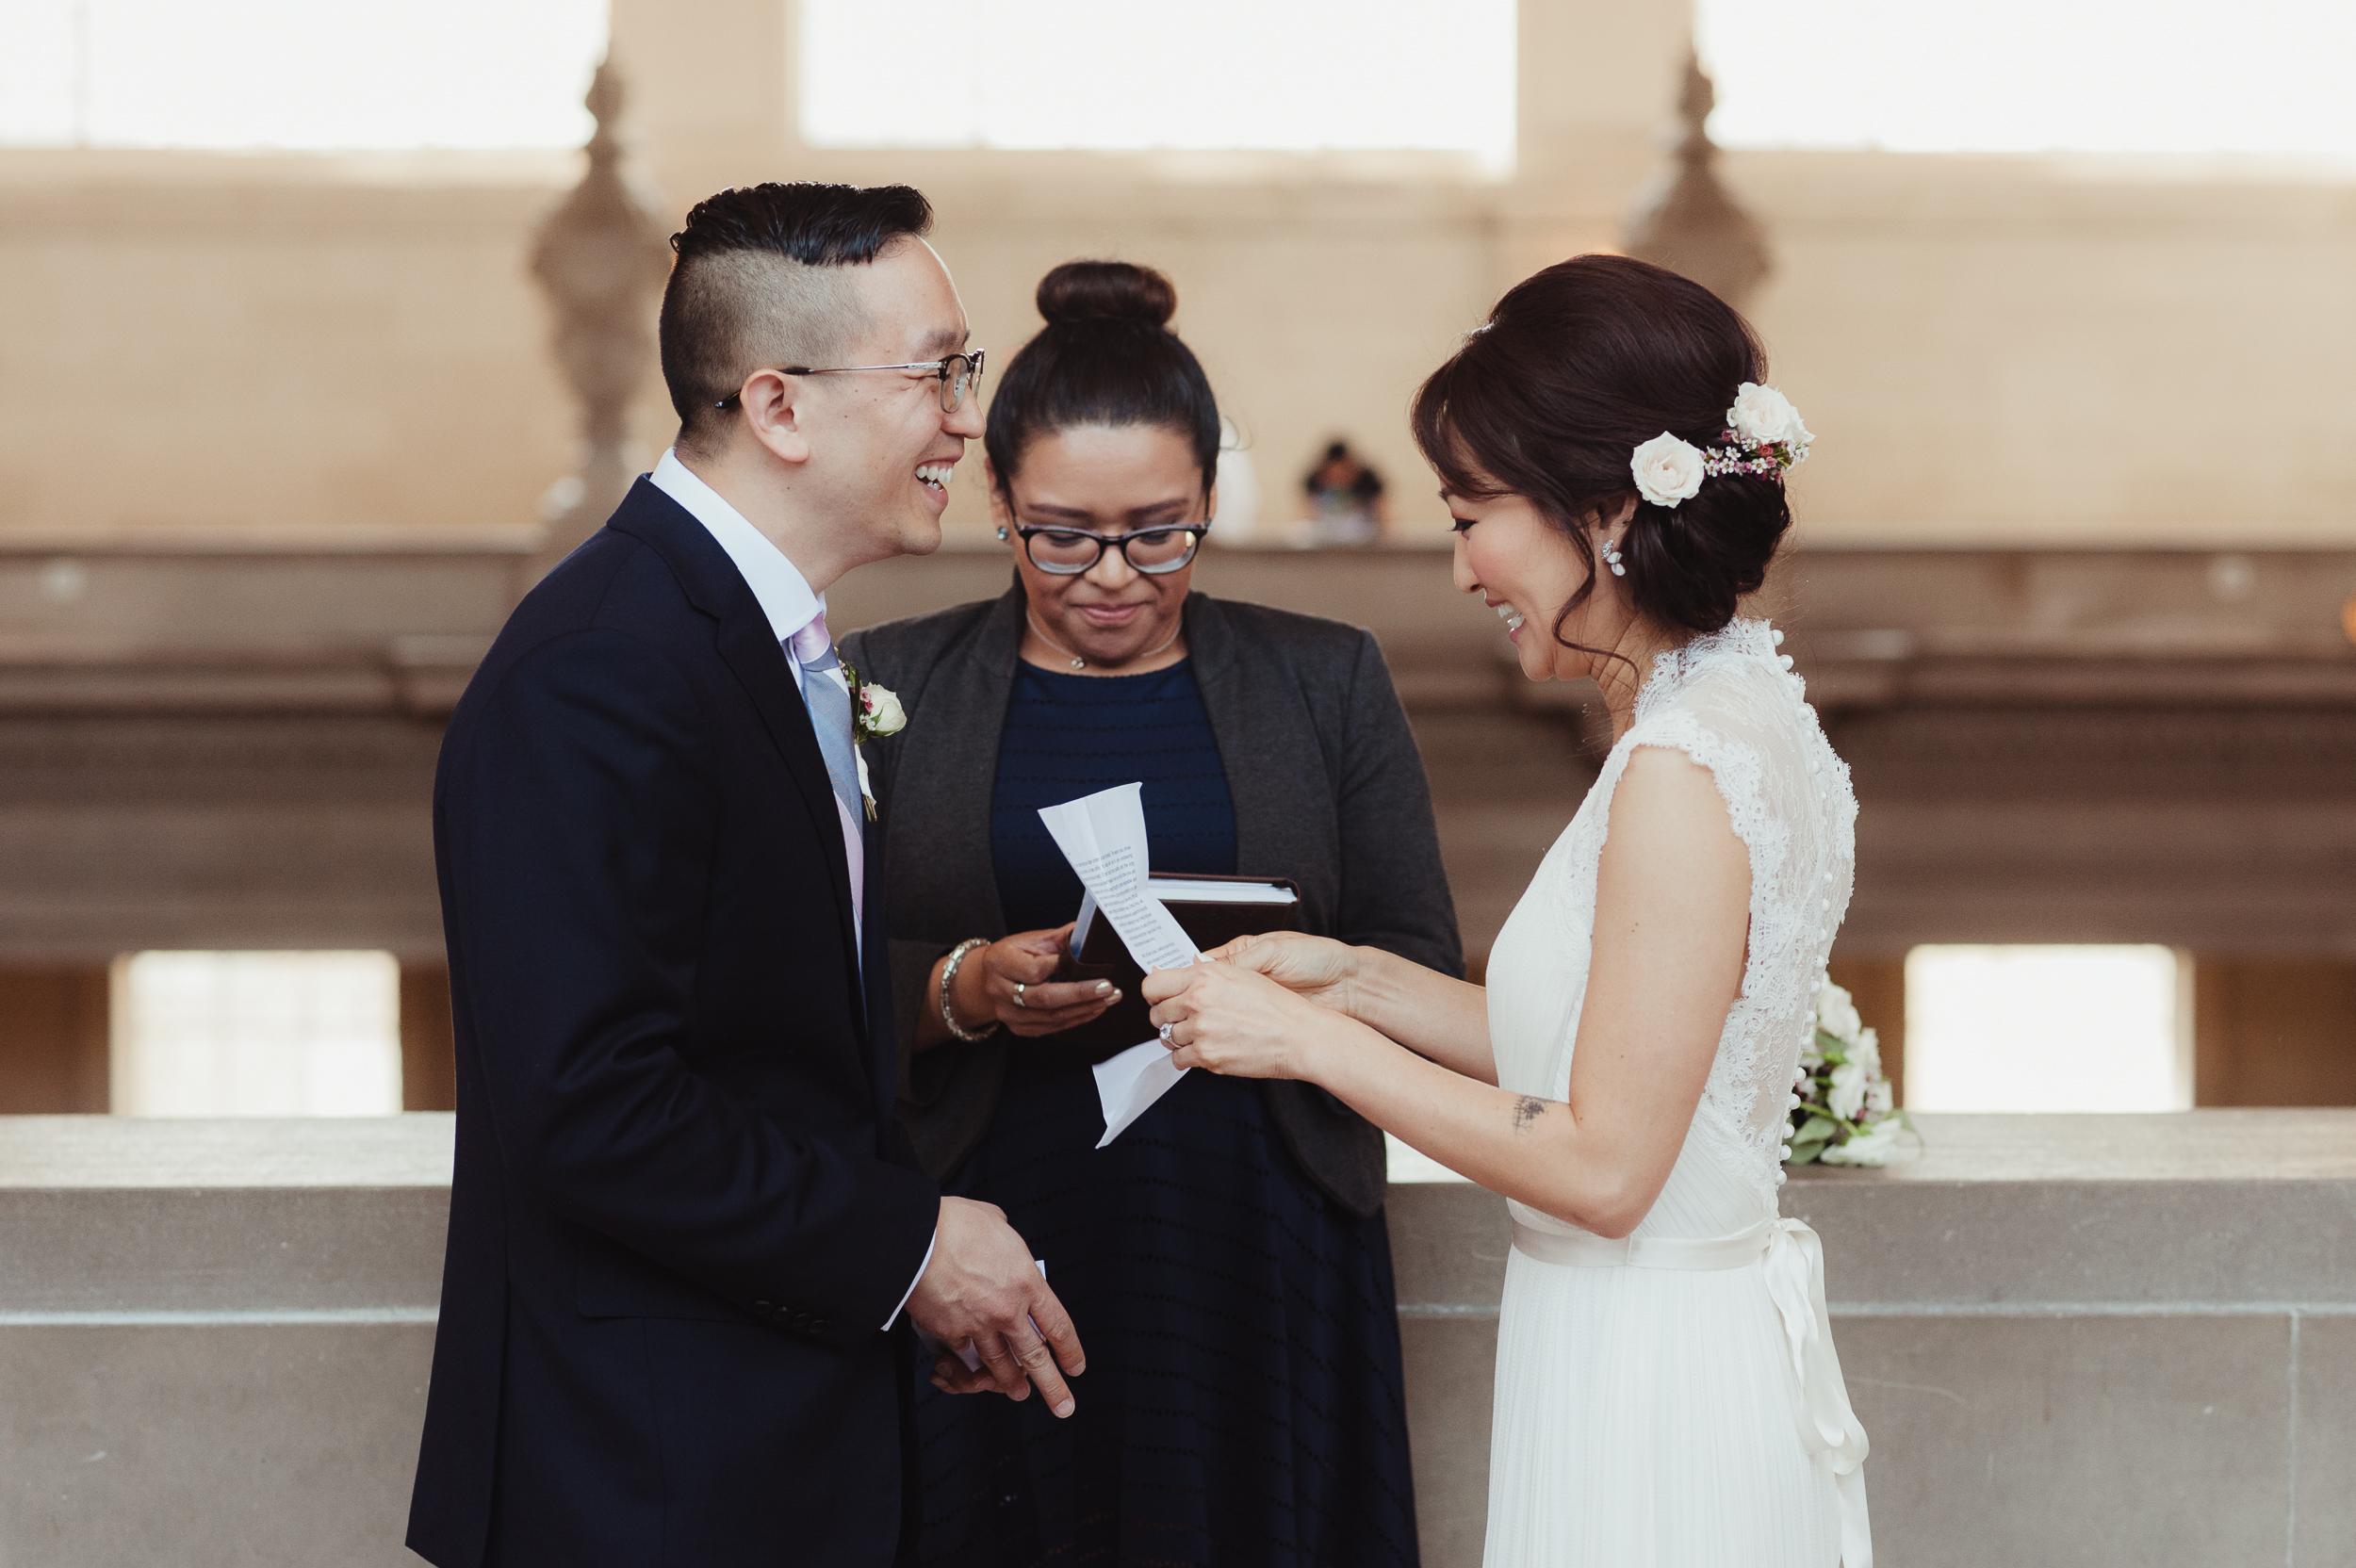 13-sf-city-hall-wedding-lands-end-vivianchen-150.jpg